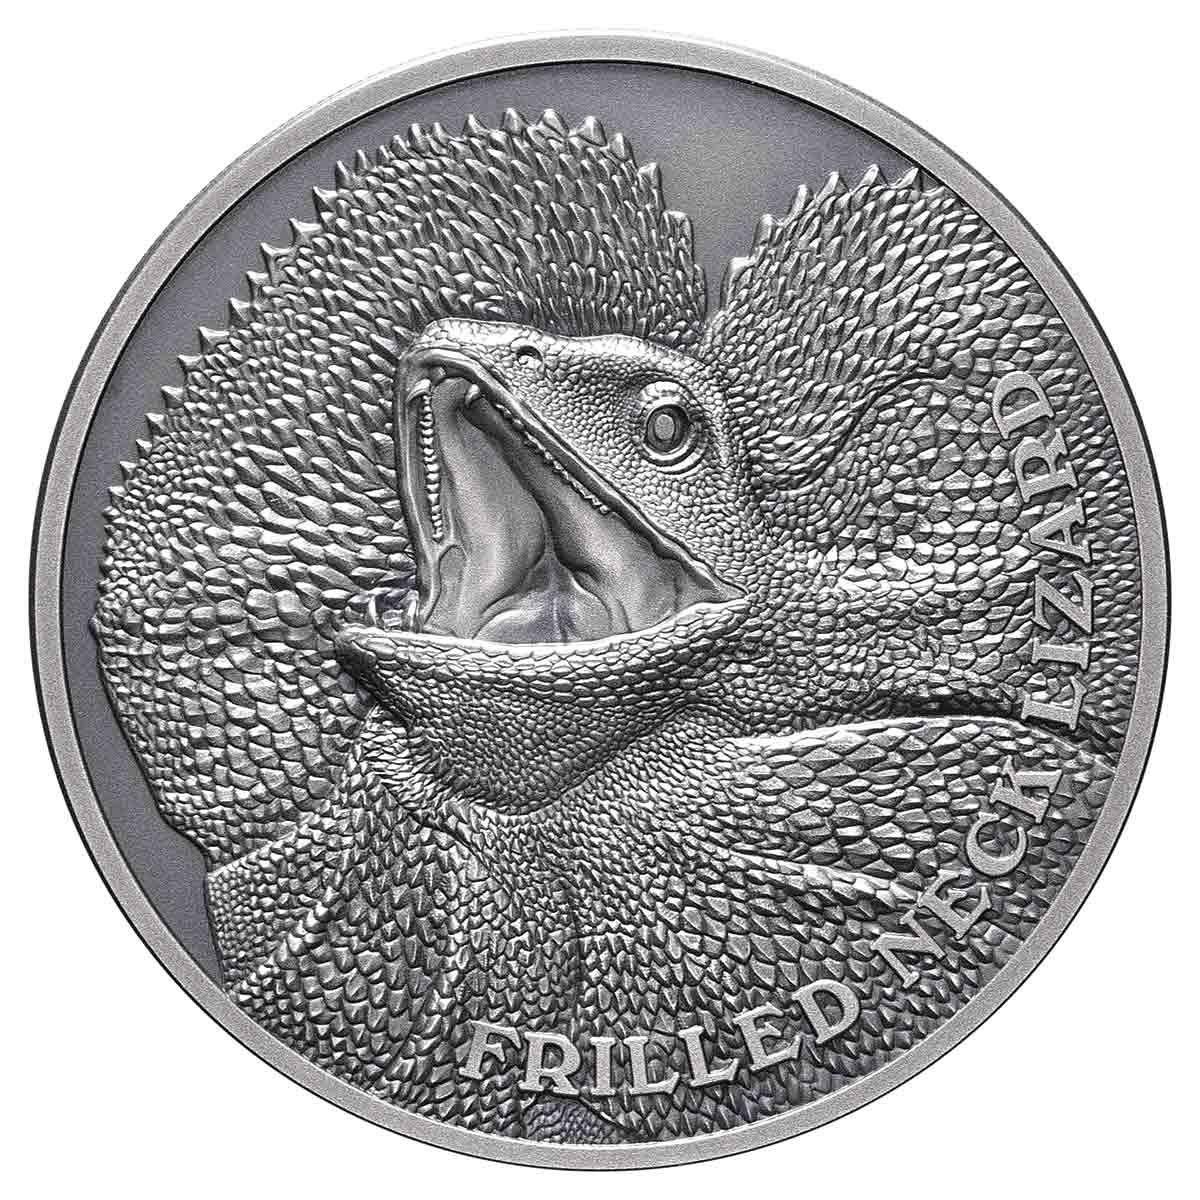 Ниуэ монета 1 доллар Плащеносная ящерица, реверс